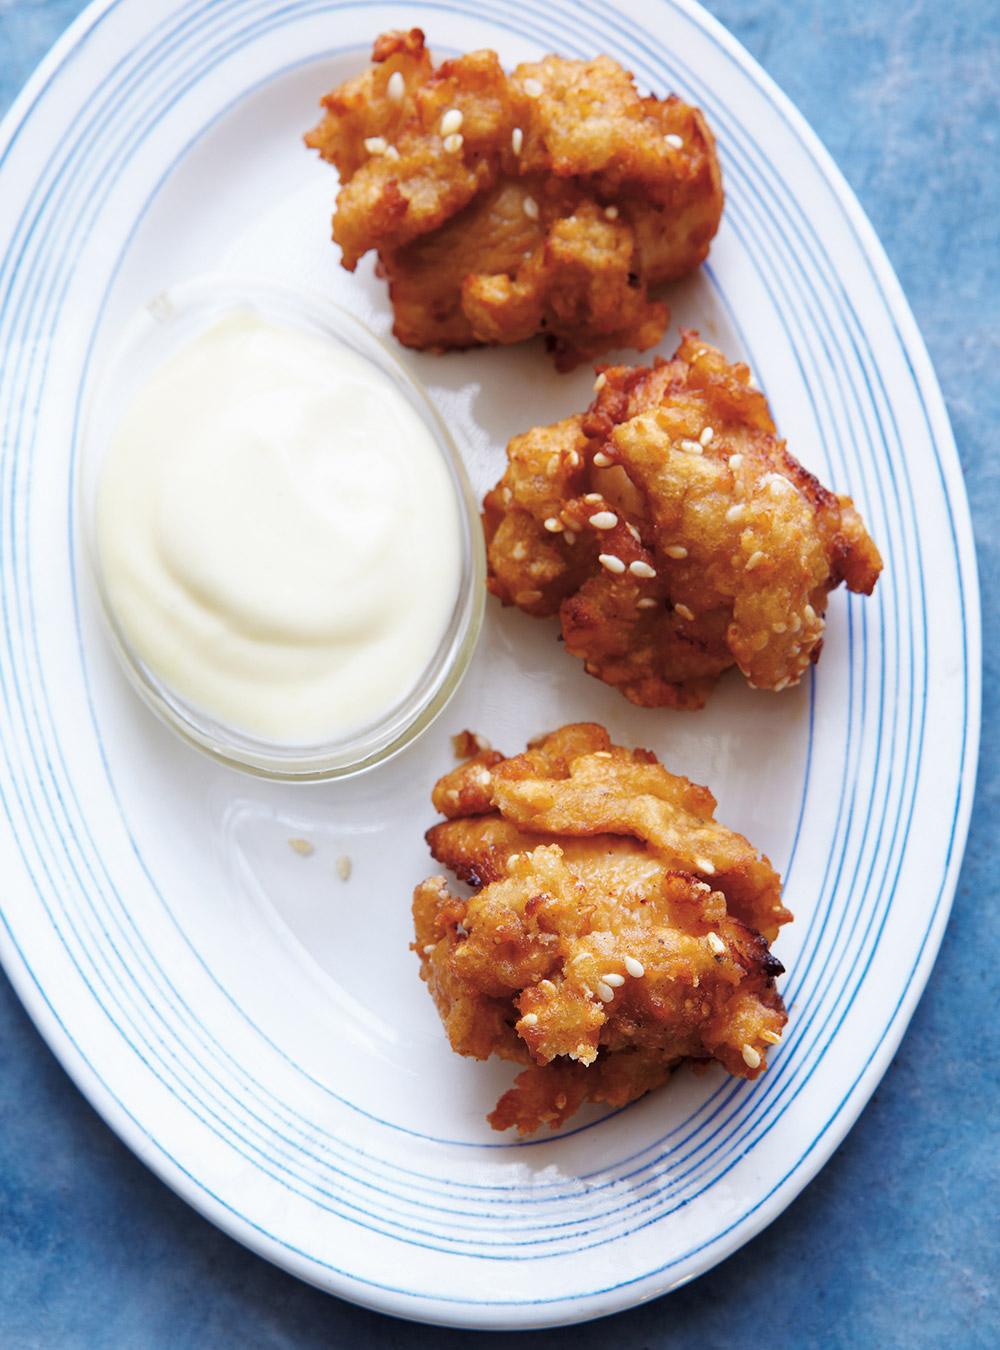 recette poulet frit au s same glouton. Black Bedroom Furniture Sets. Home Design Ideas